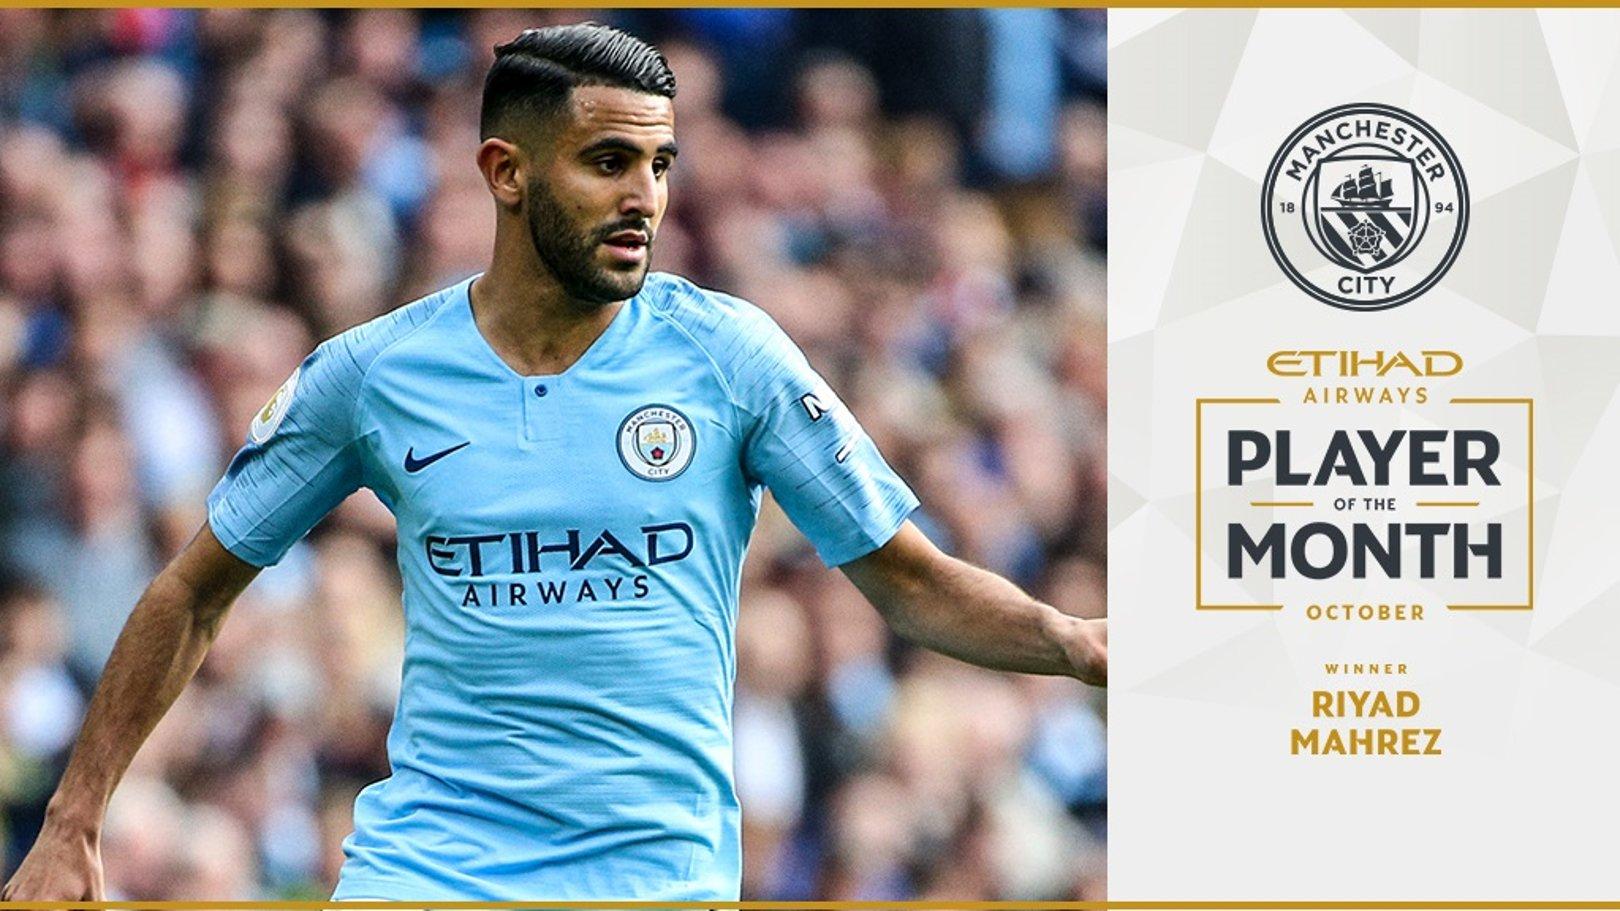 Mahrez voted October Etihad Player of the Month